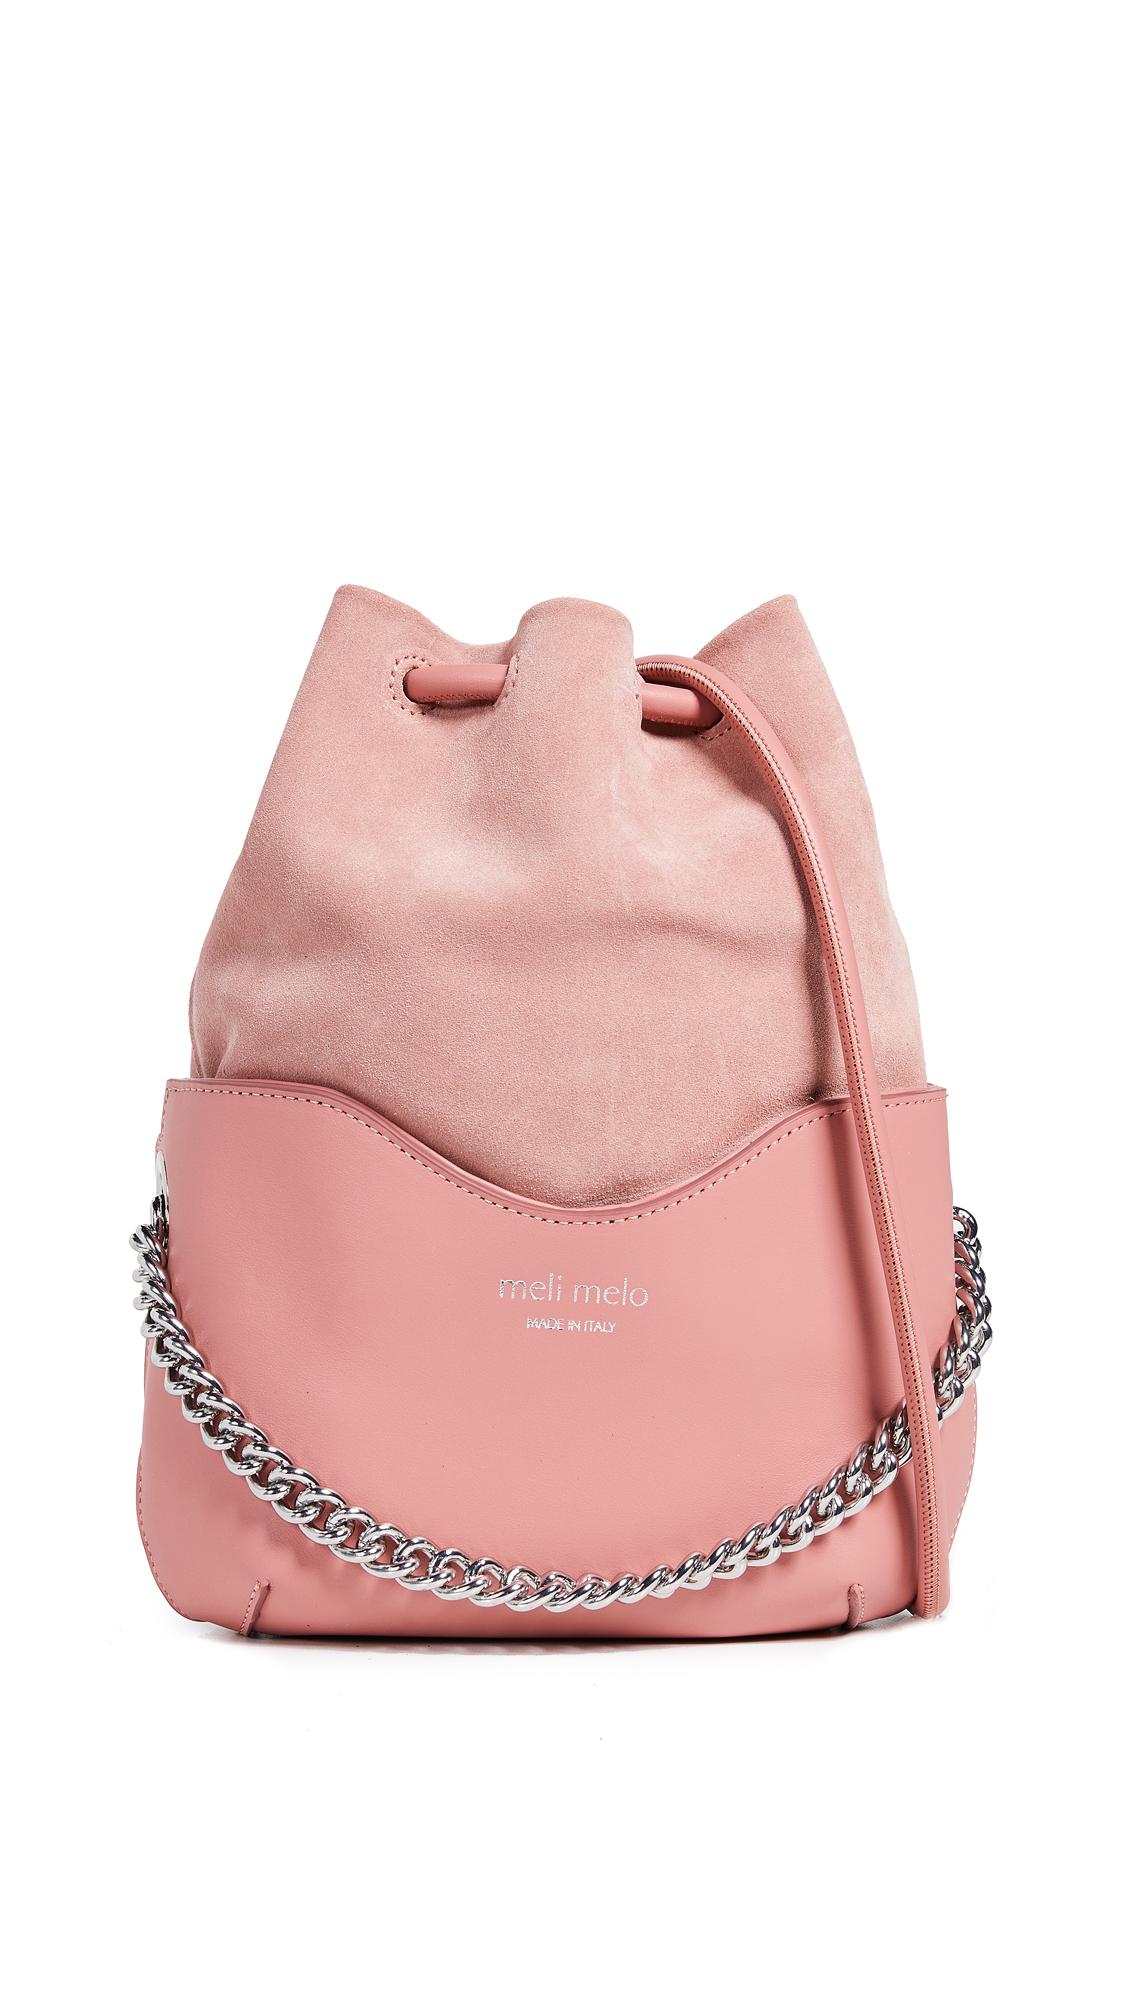 MELI MELO HETTY DAPHNE BUCKET BAG